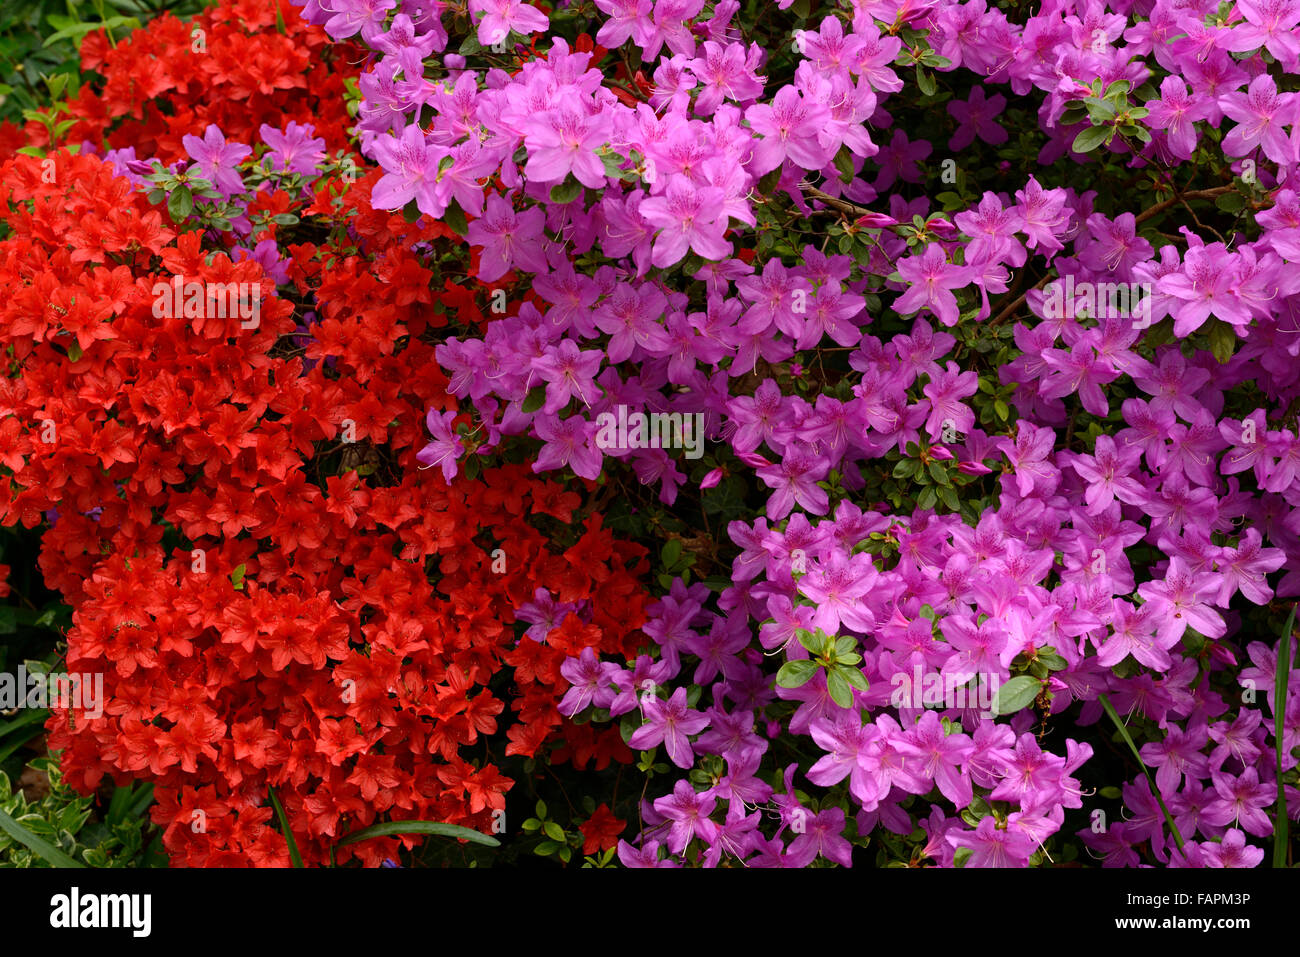 Flowering Red Azalea Stock Photos & Flowering Red Azalea Stock ...